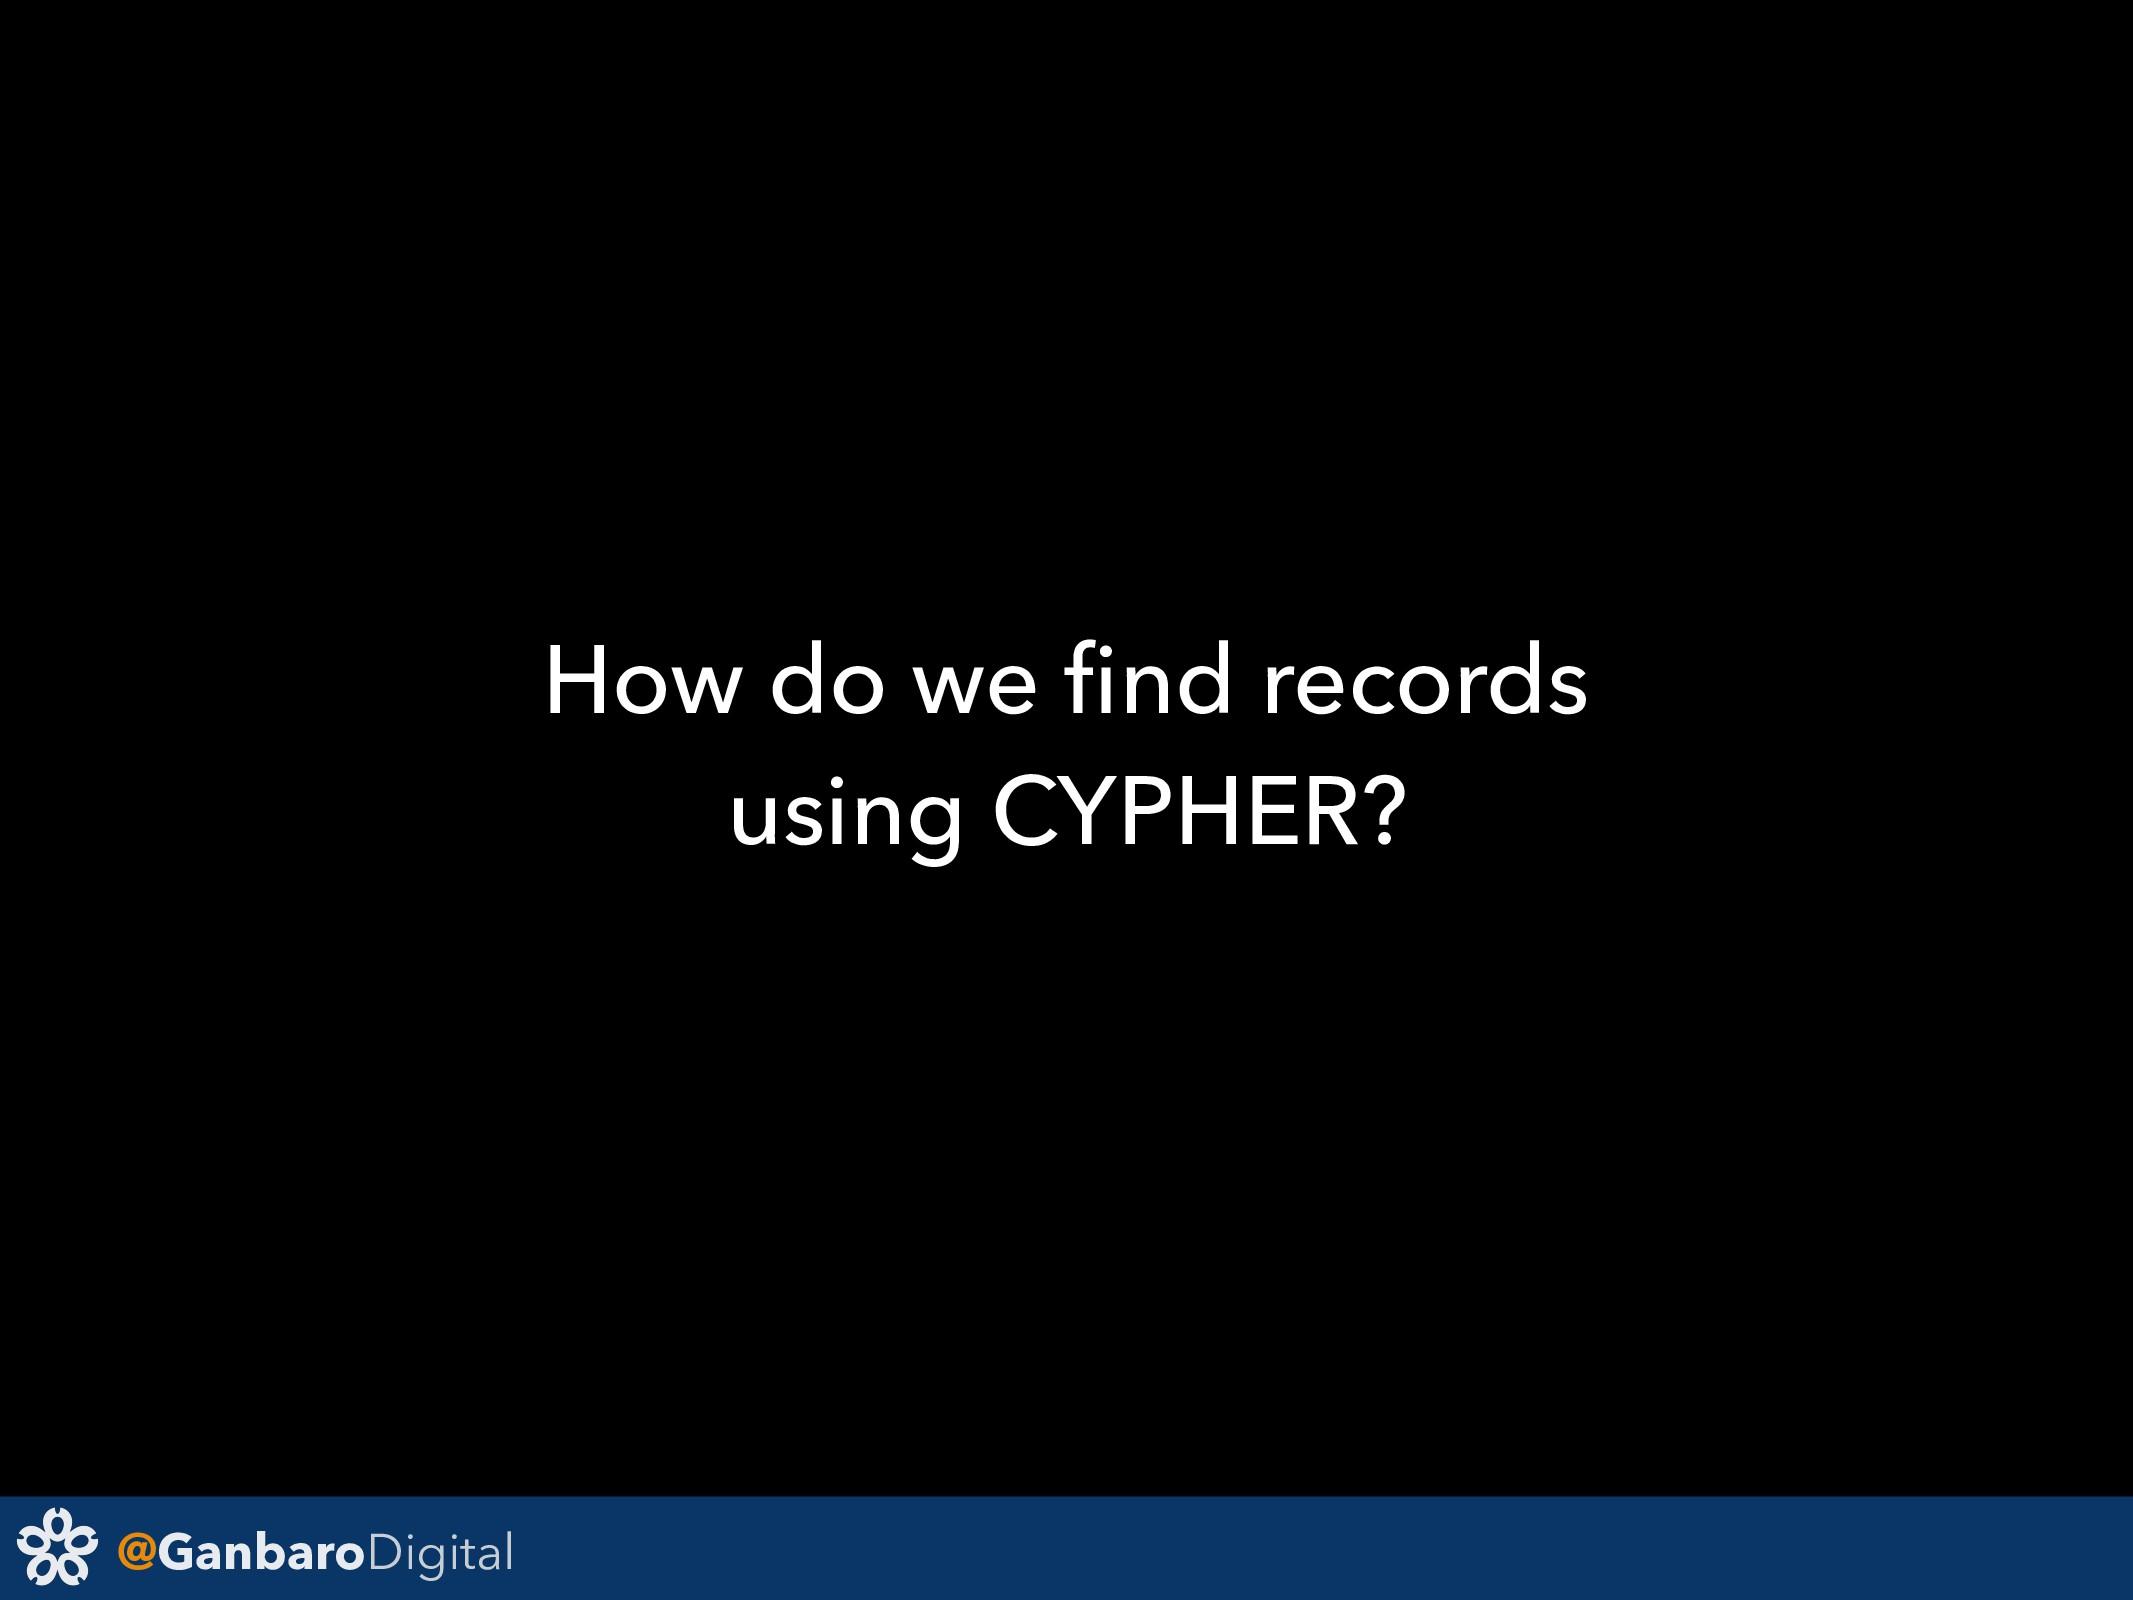 @GanbaroDigital How do we find records using CYP...